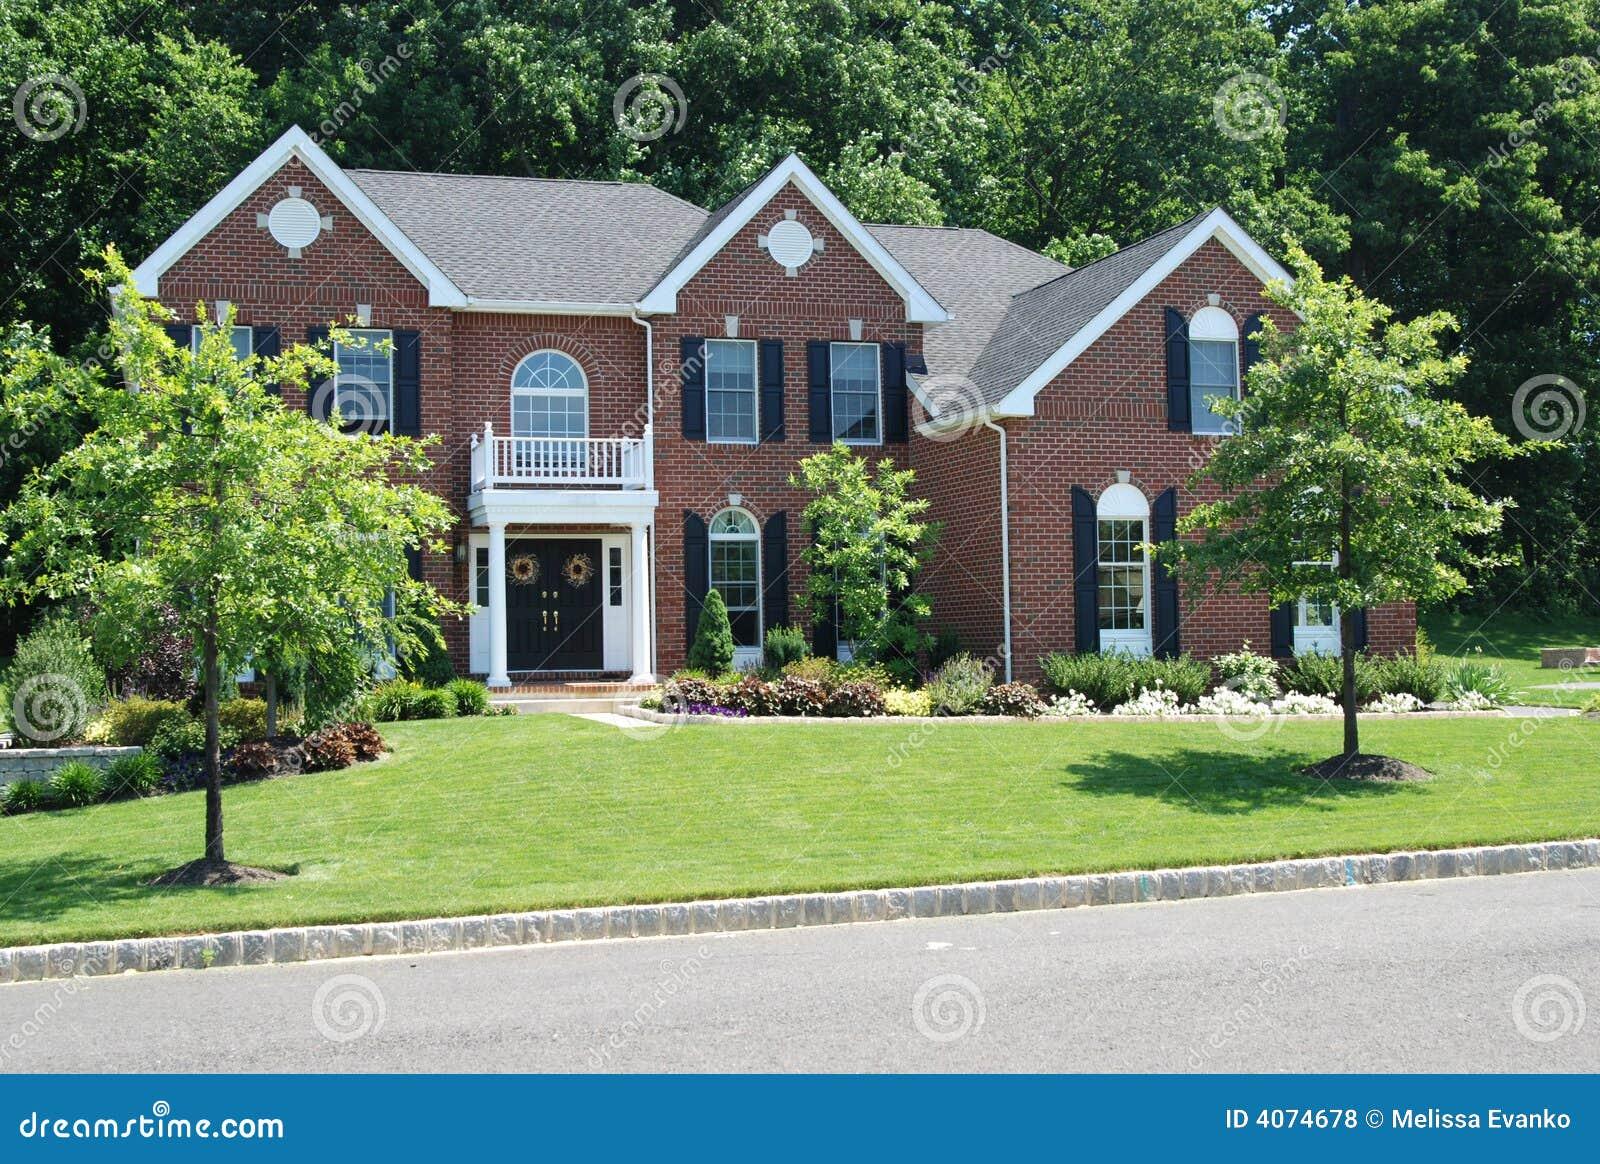 Nice House Royalty Free Stock Photos Image 4074678